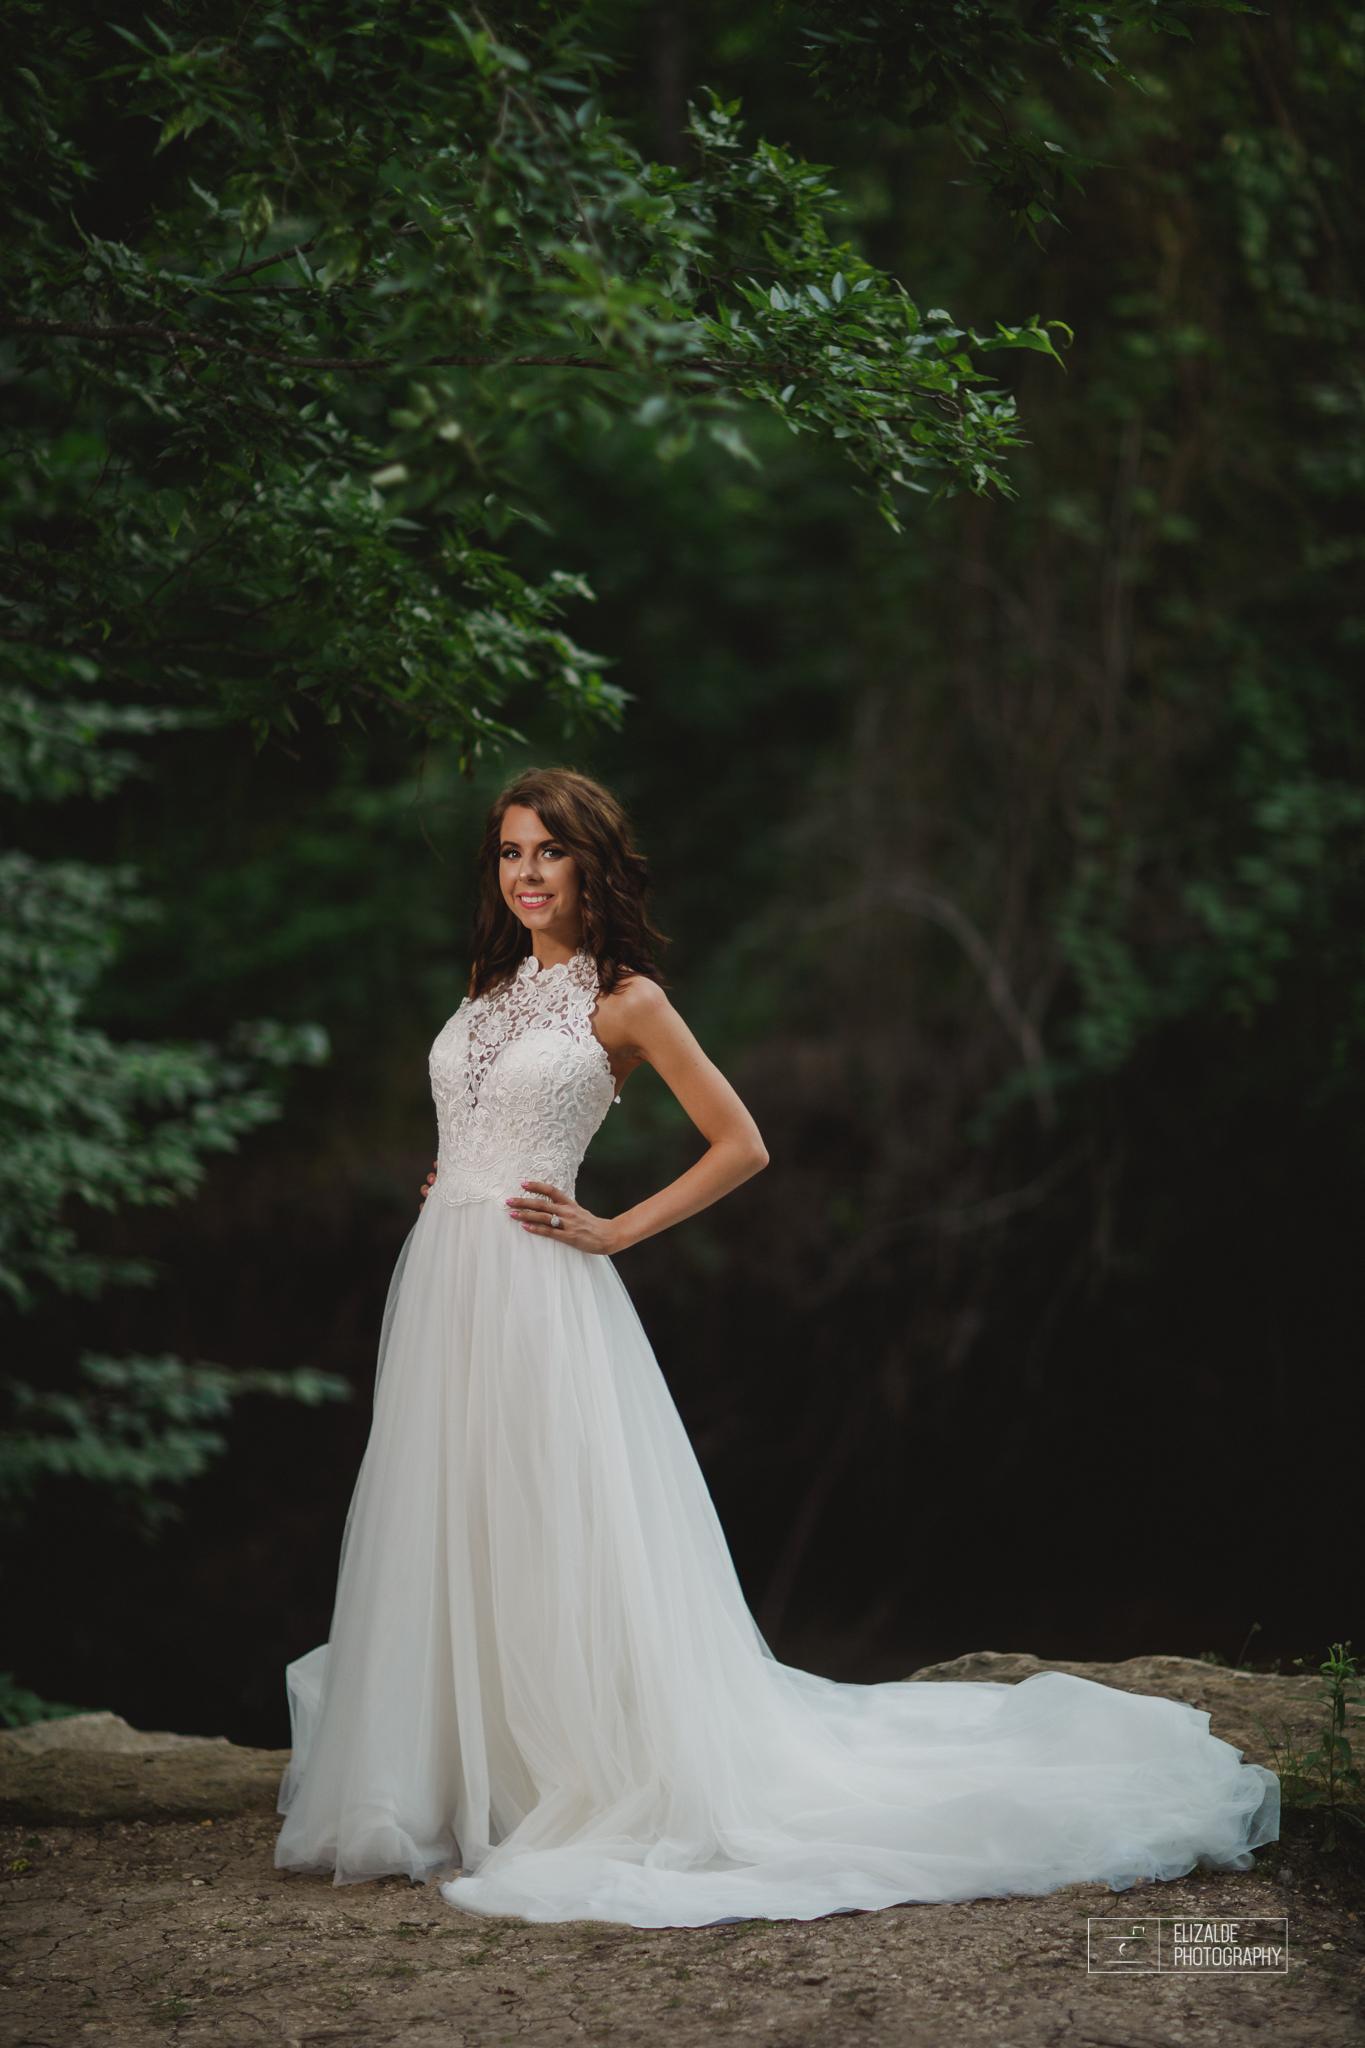 Bridal session_Dallas Photographer_Elizalde Photography_Denton photographer_ DFW Photographer_ Wedding Photographer_Baleigh14.jpg